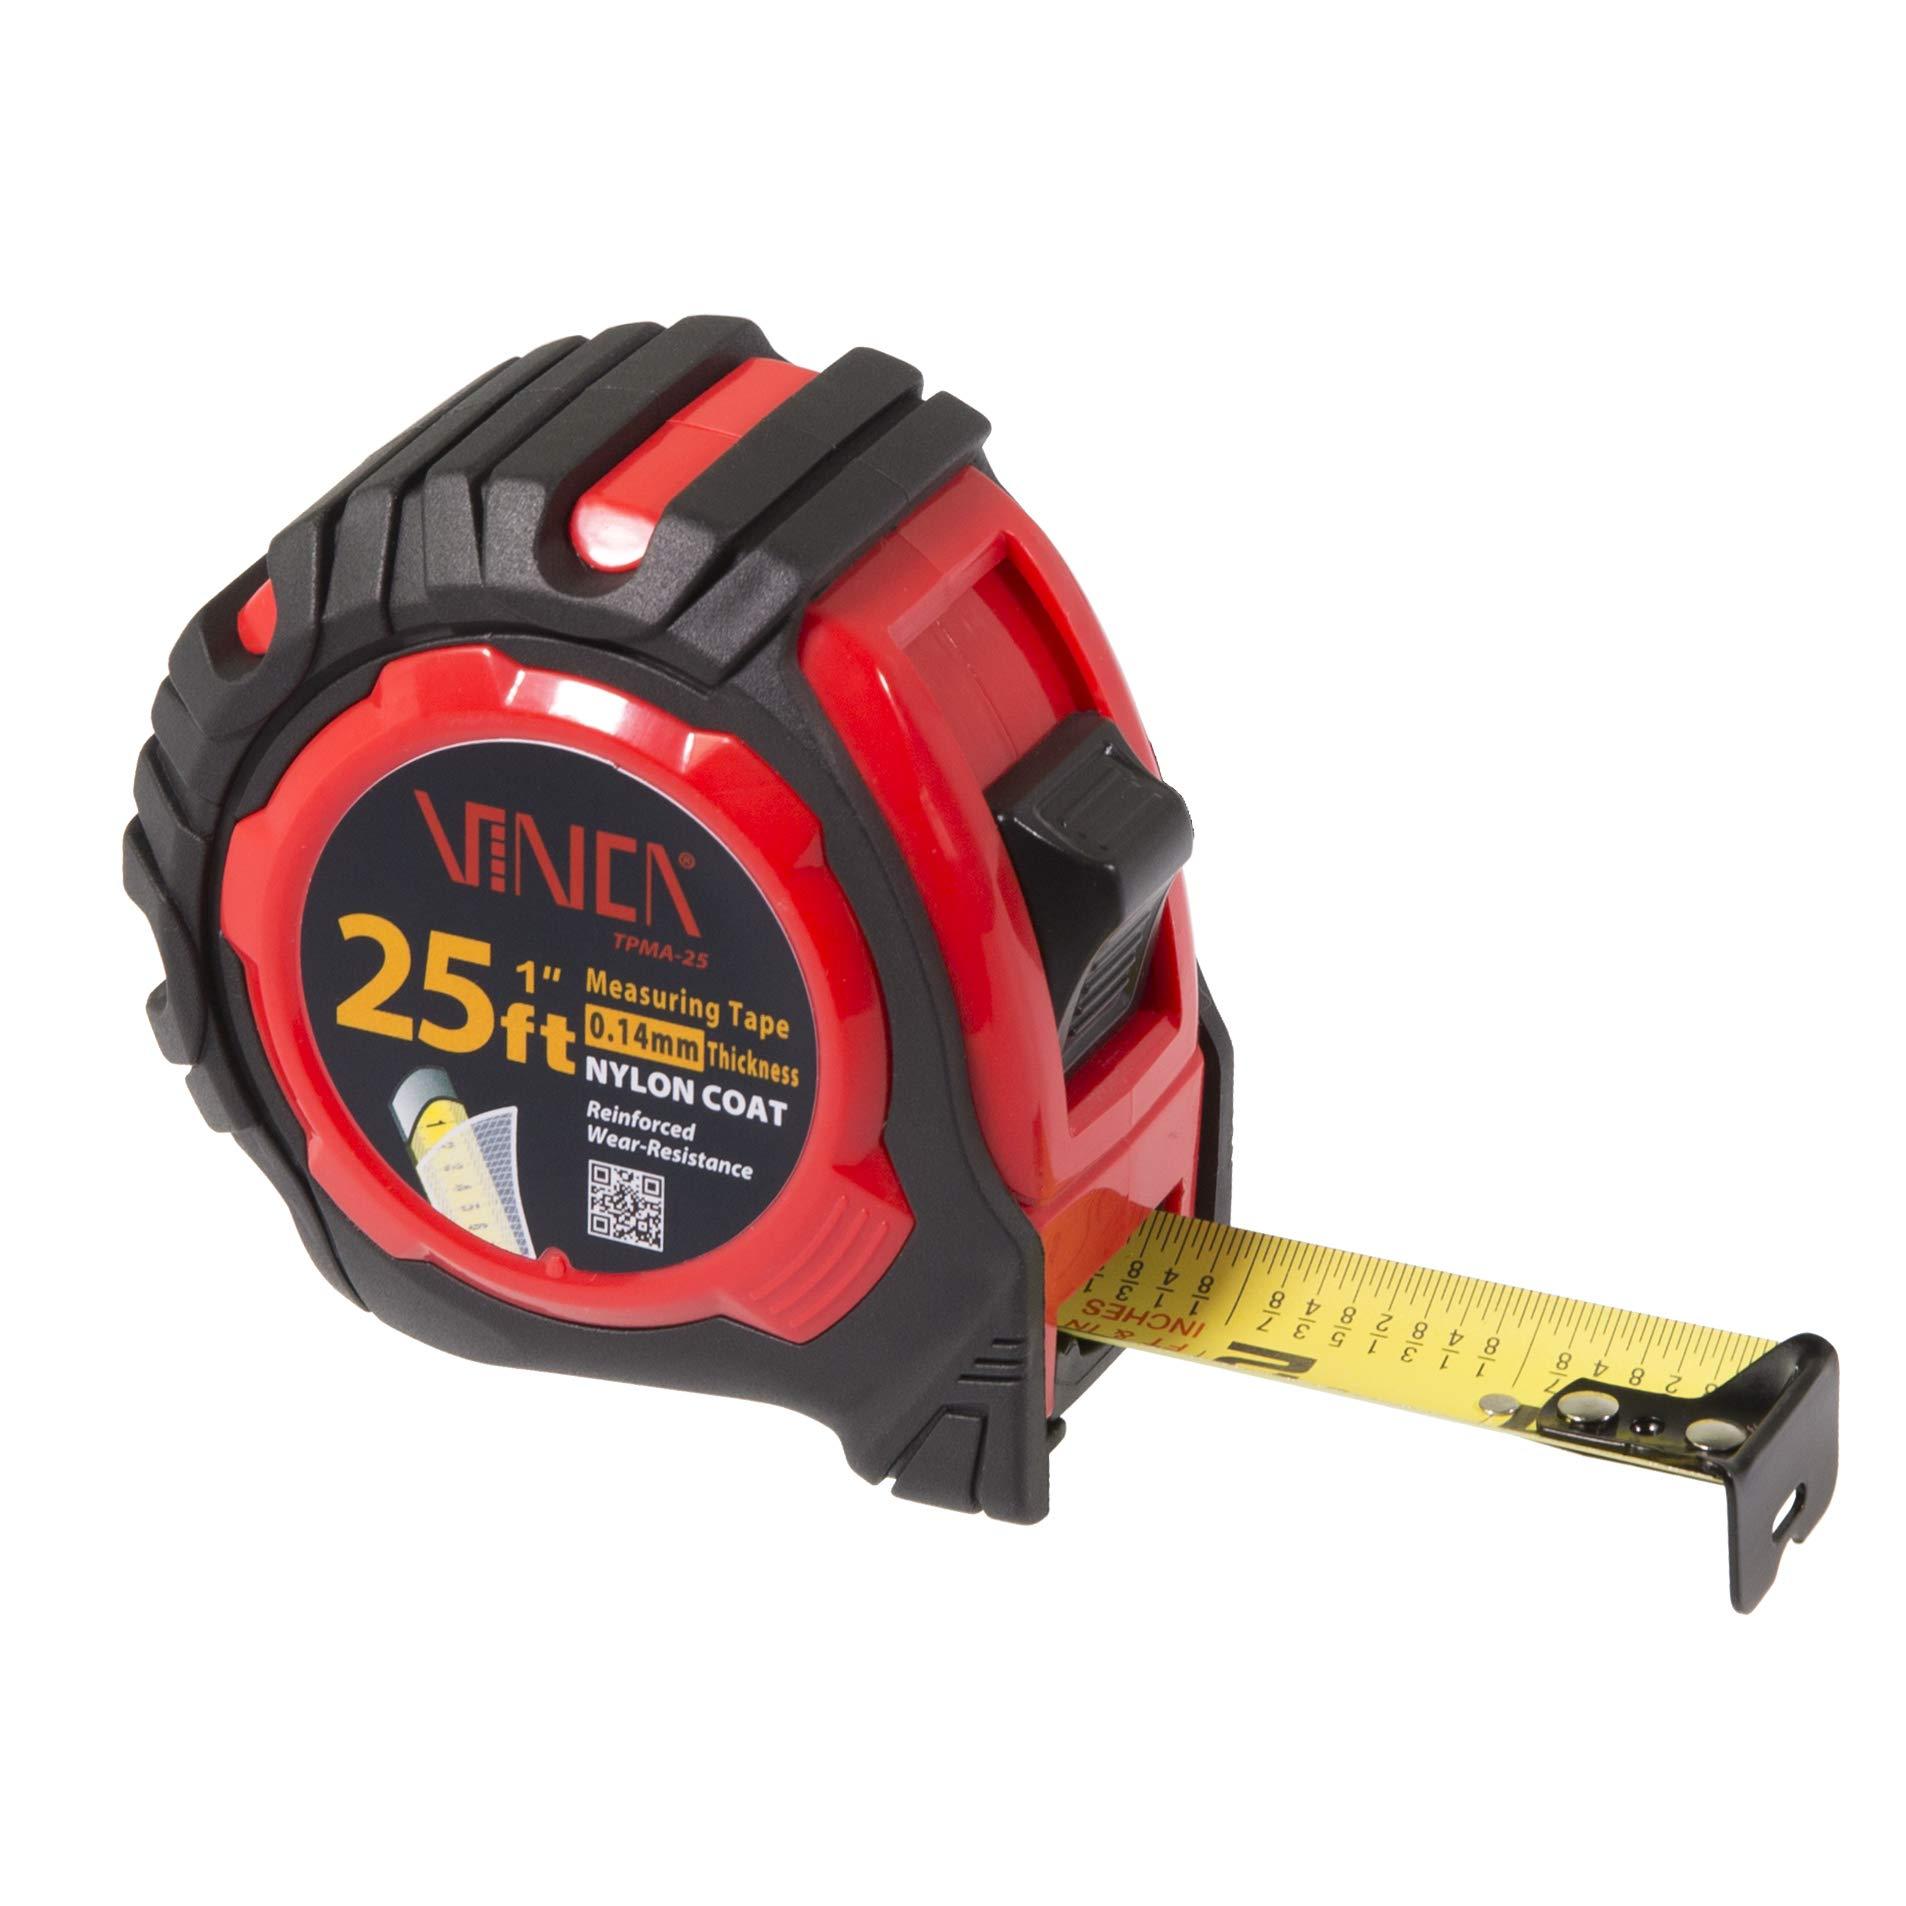 VINCA TPMA 25 Measure Visibility Marking